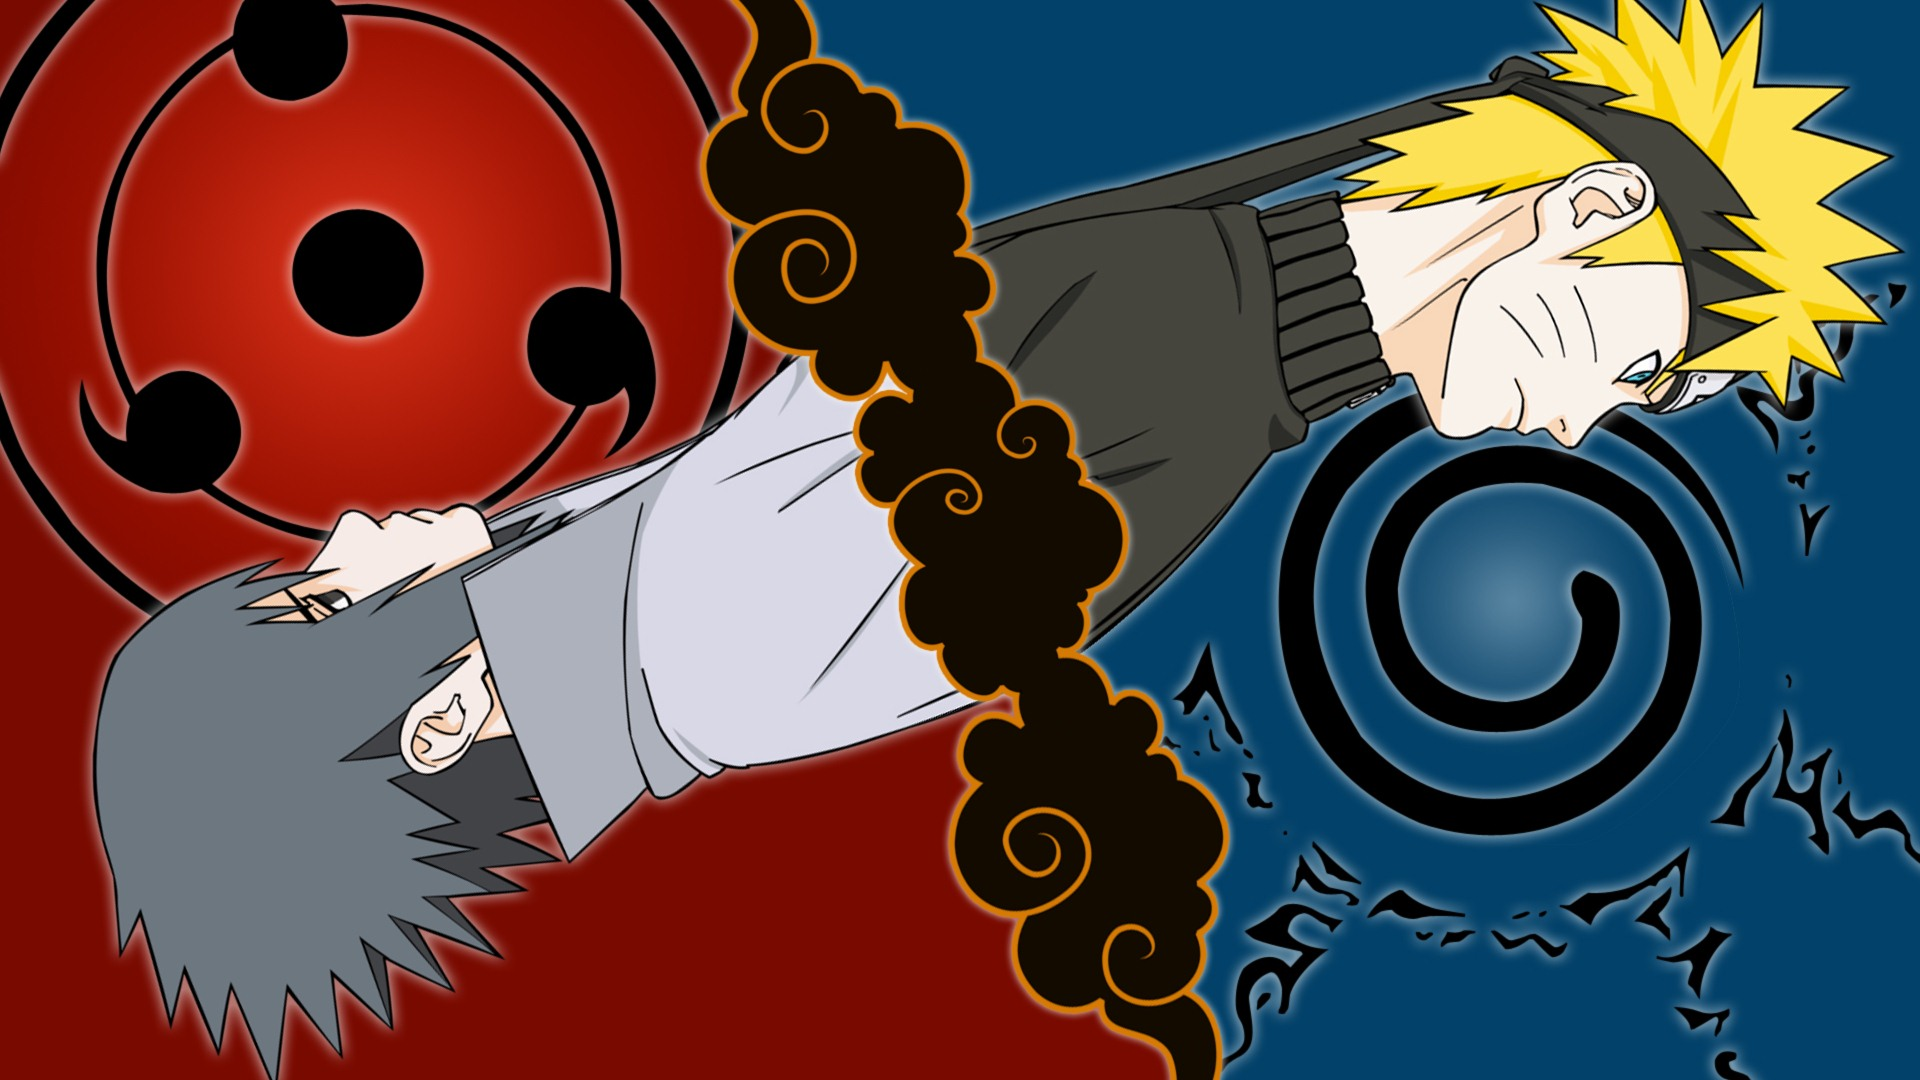 Naruto Wallpapers Anime HD 1800p Desktop Wallpapers Naruto 1920x1080